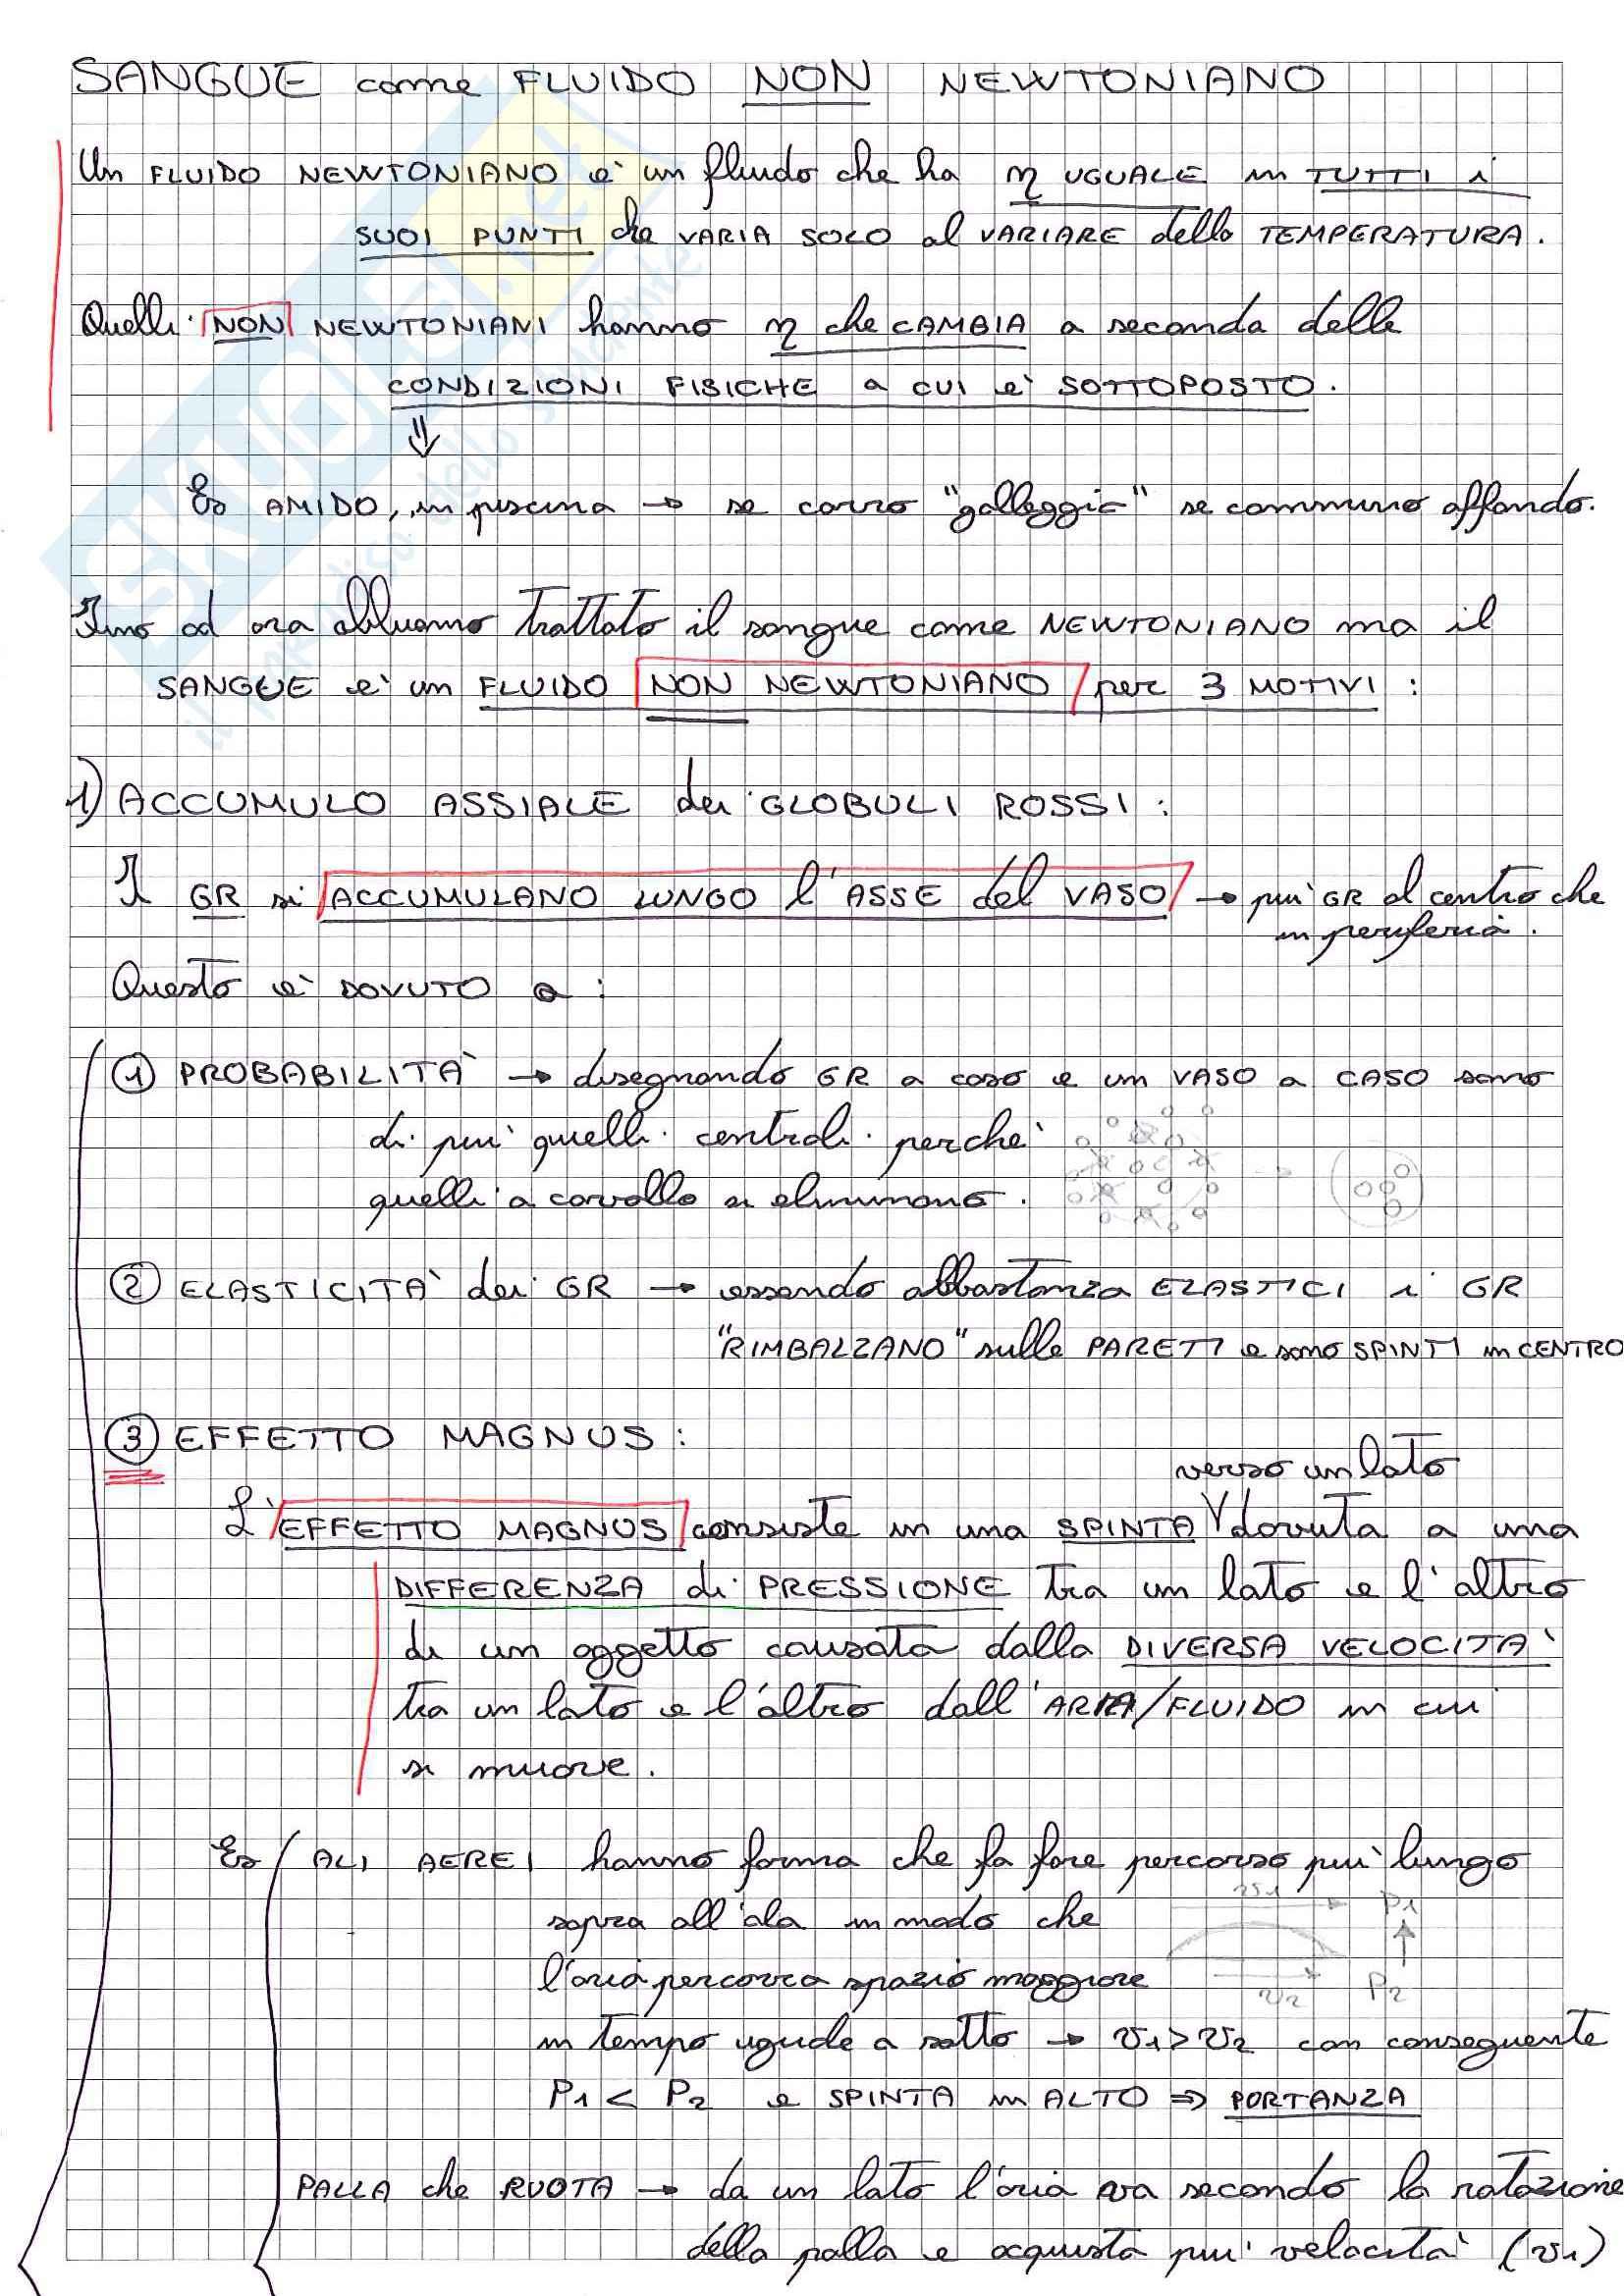 Riassunto esame Fisiologia, prof Minetti, libro consigliato Fisiologia Umana, Baldissera (parte 1) Pag. 26